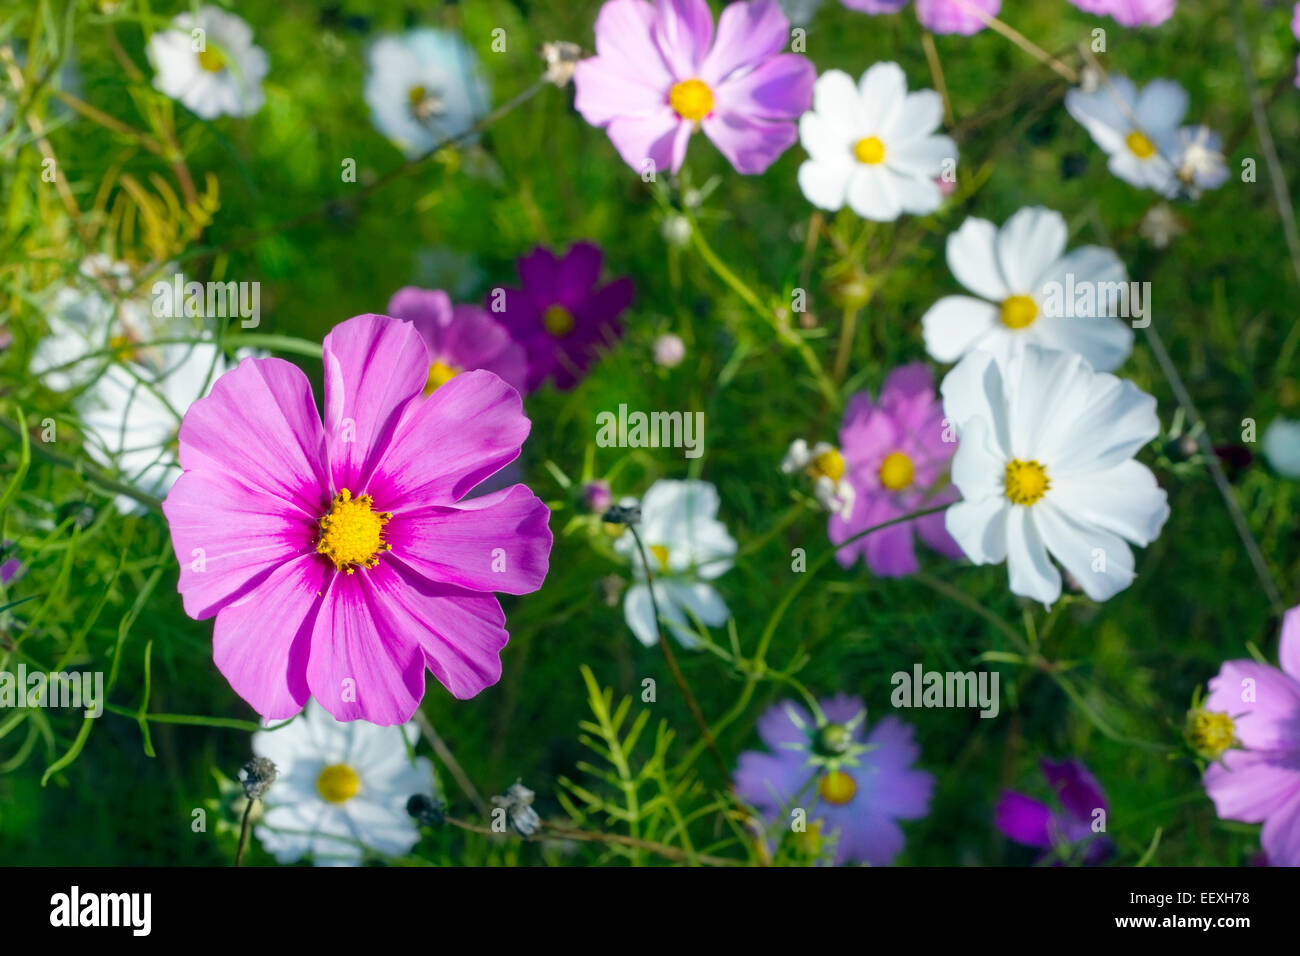 Cosmos daisies immagini cosmos daisies fotos stock alamy